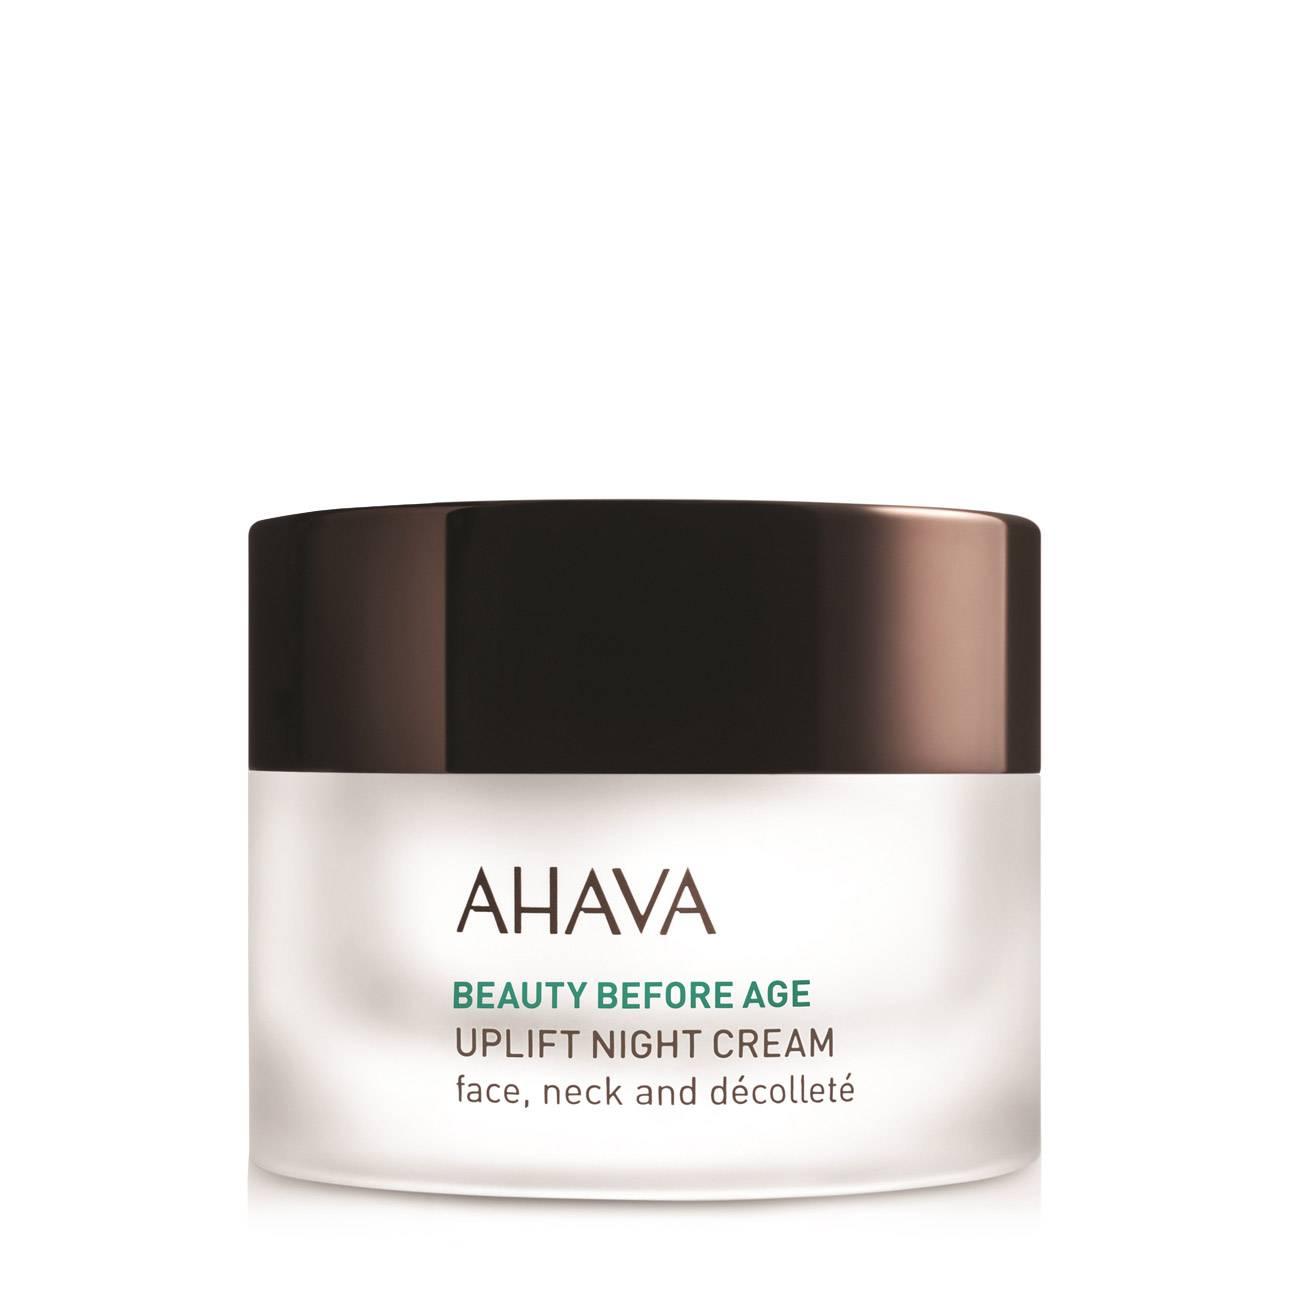 Beauty Before Age Uplift Night Cream 50 Ml Ahava imagine 2021 bestvalue.eu